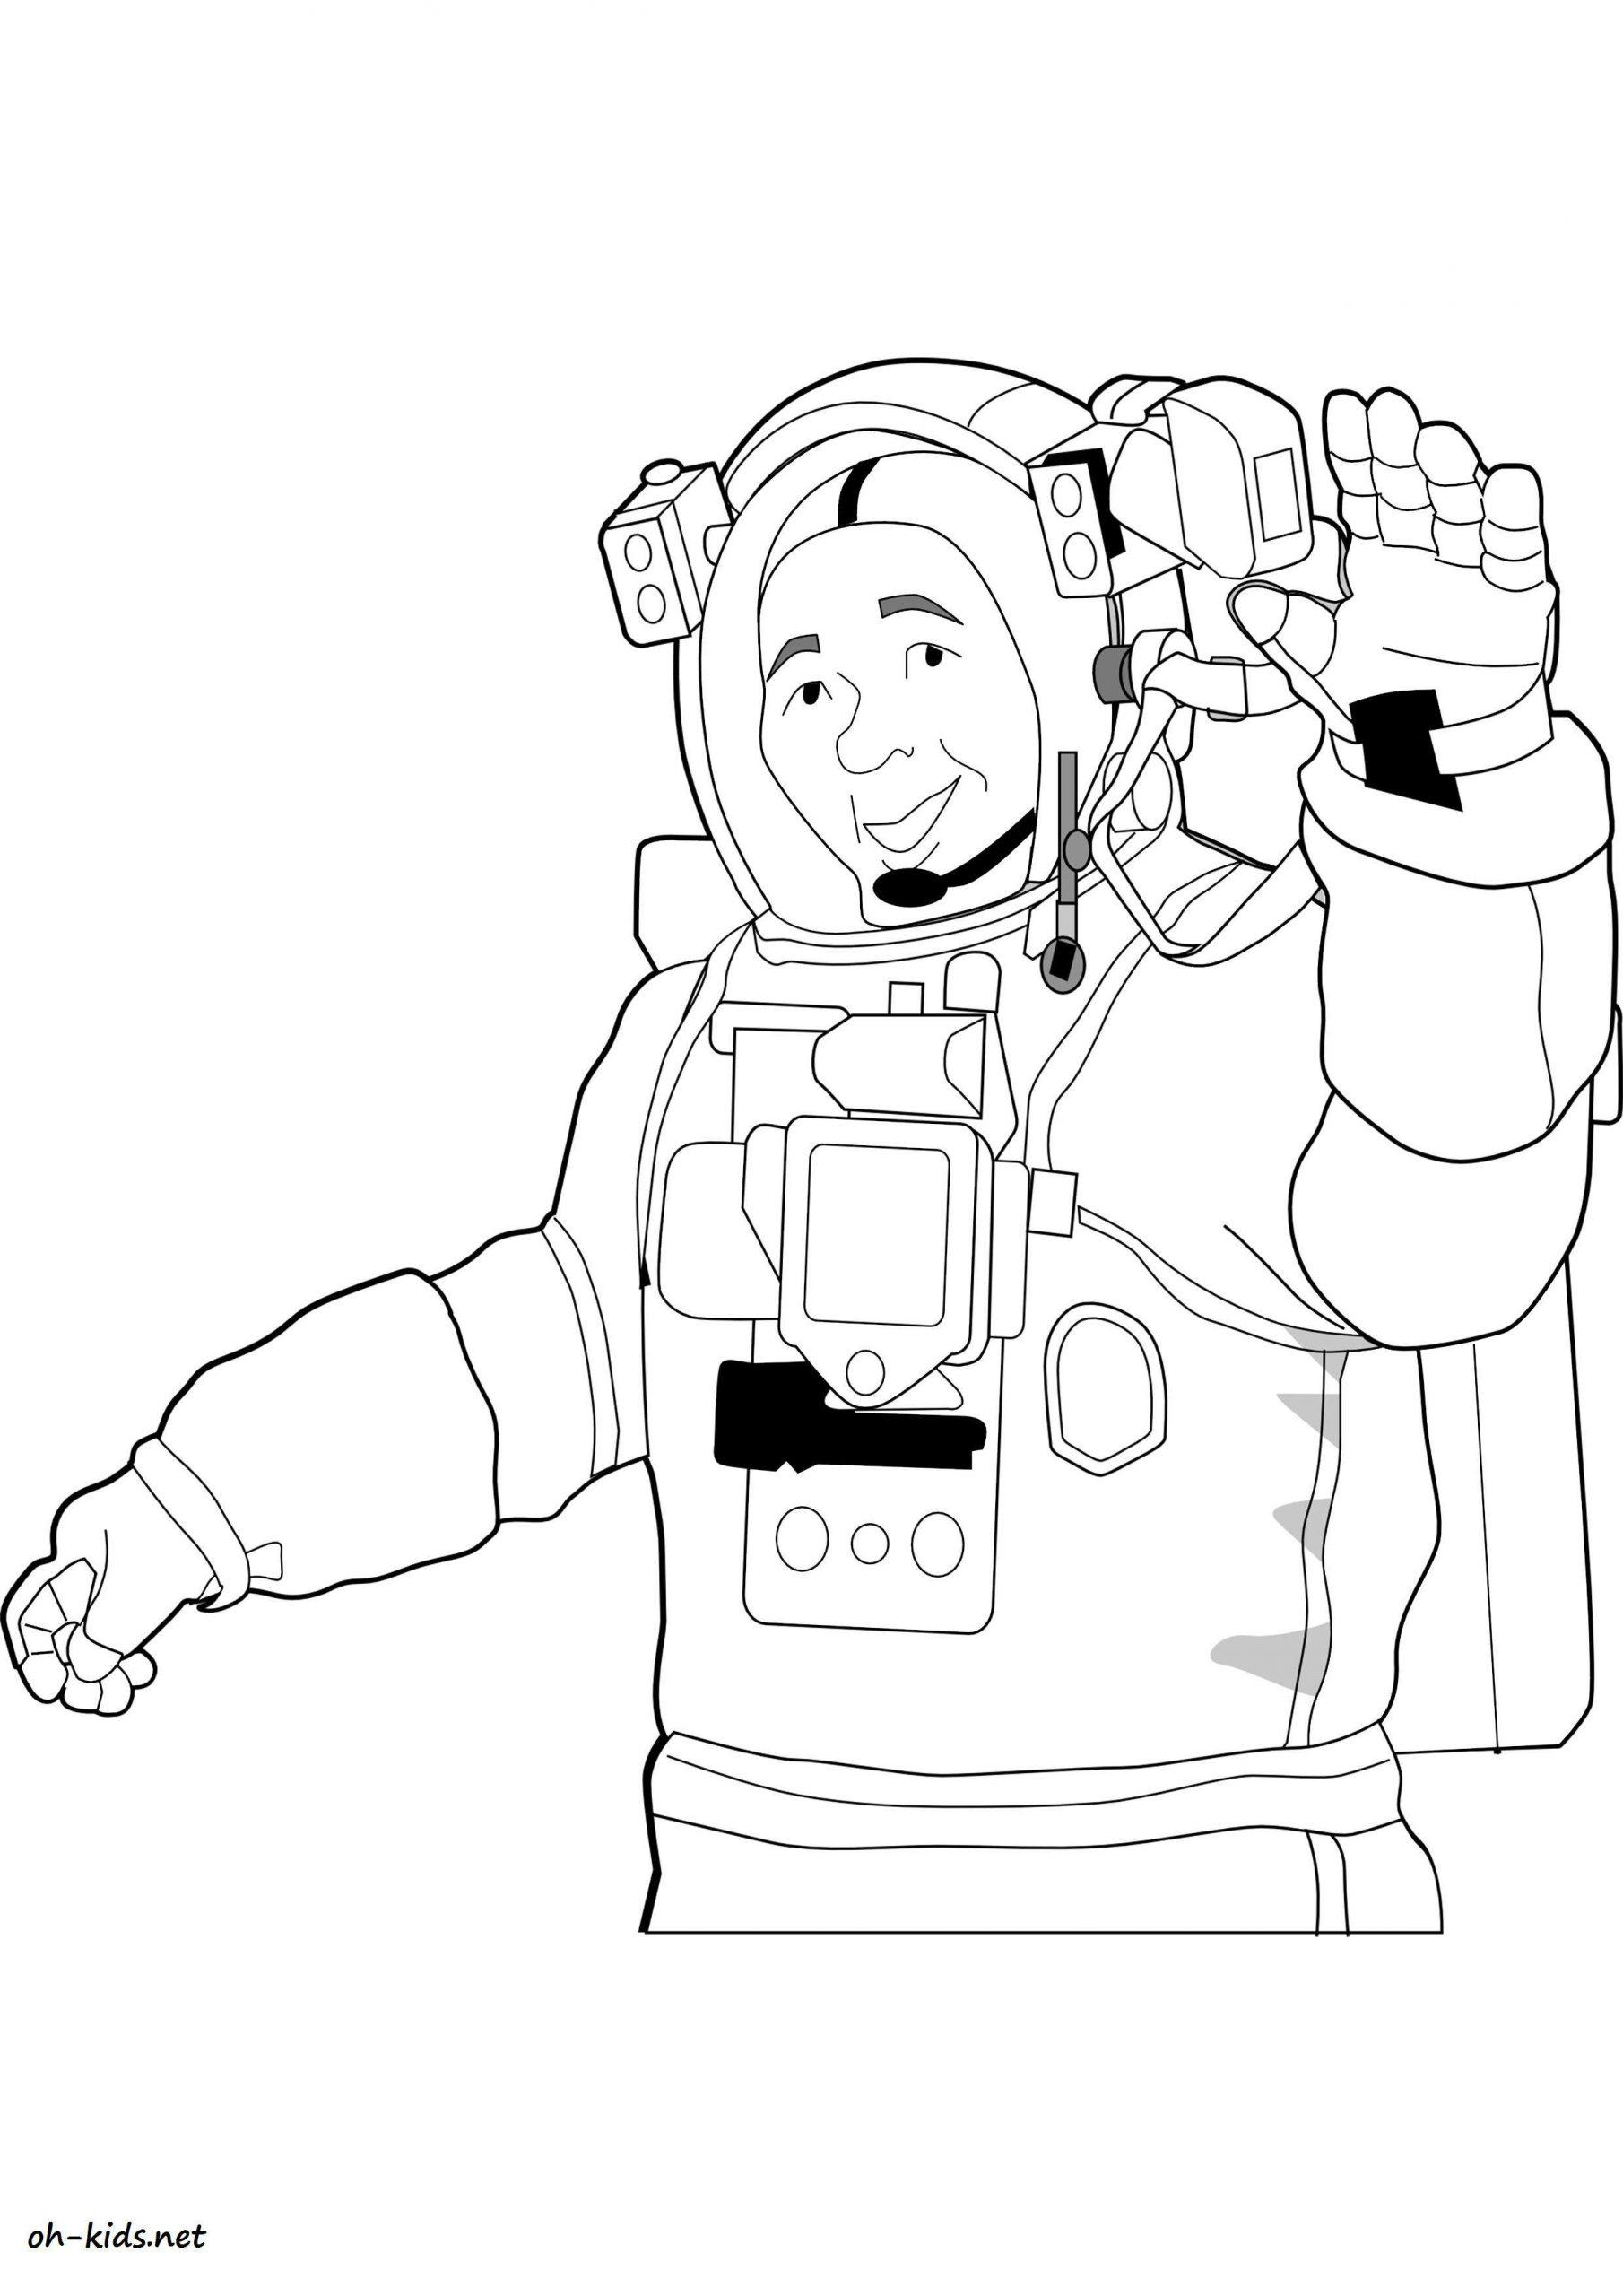 Dessin #1490 - Coloriage Astronaute À Imprimer - Oh-Kids avec Coloriage Astronaute